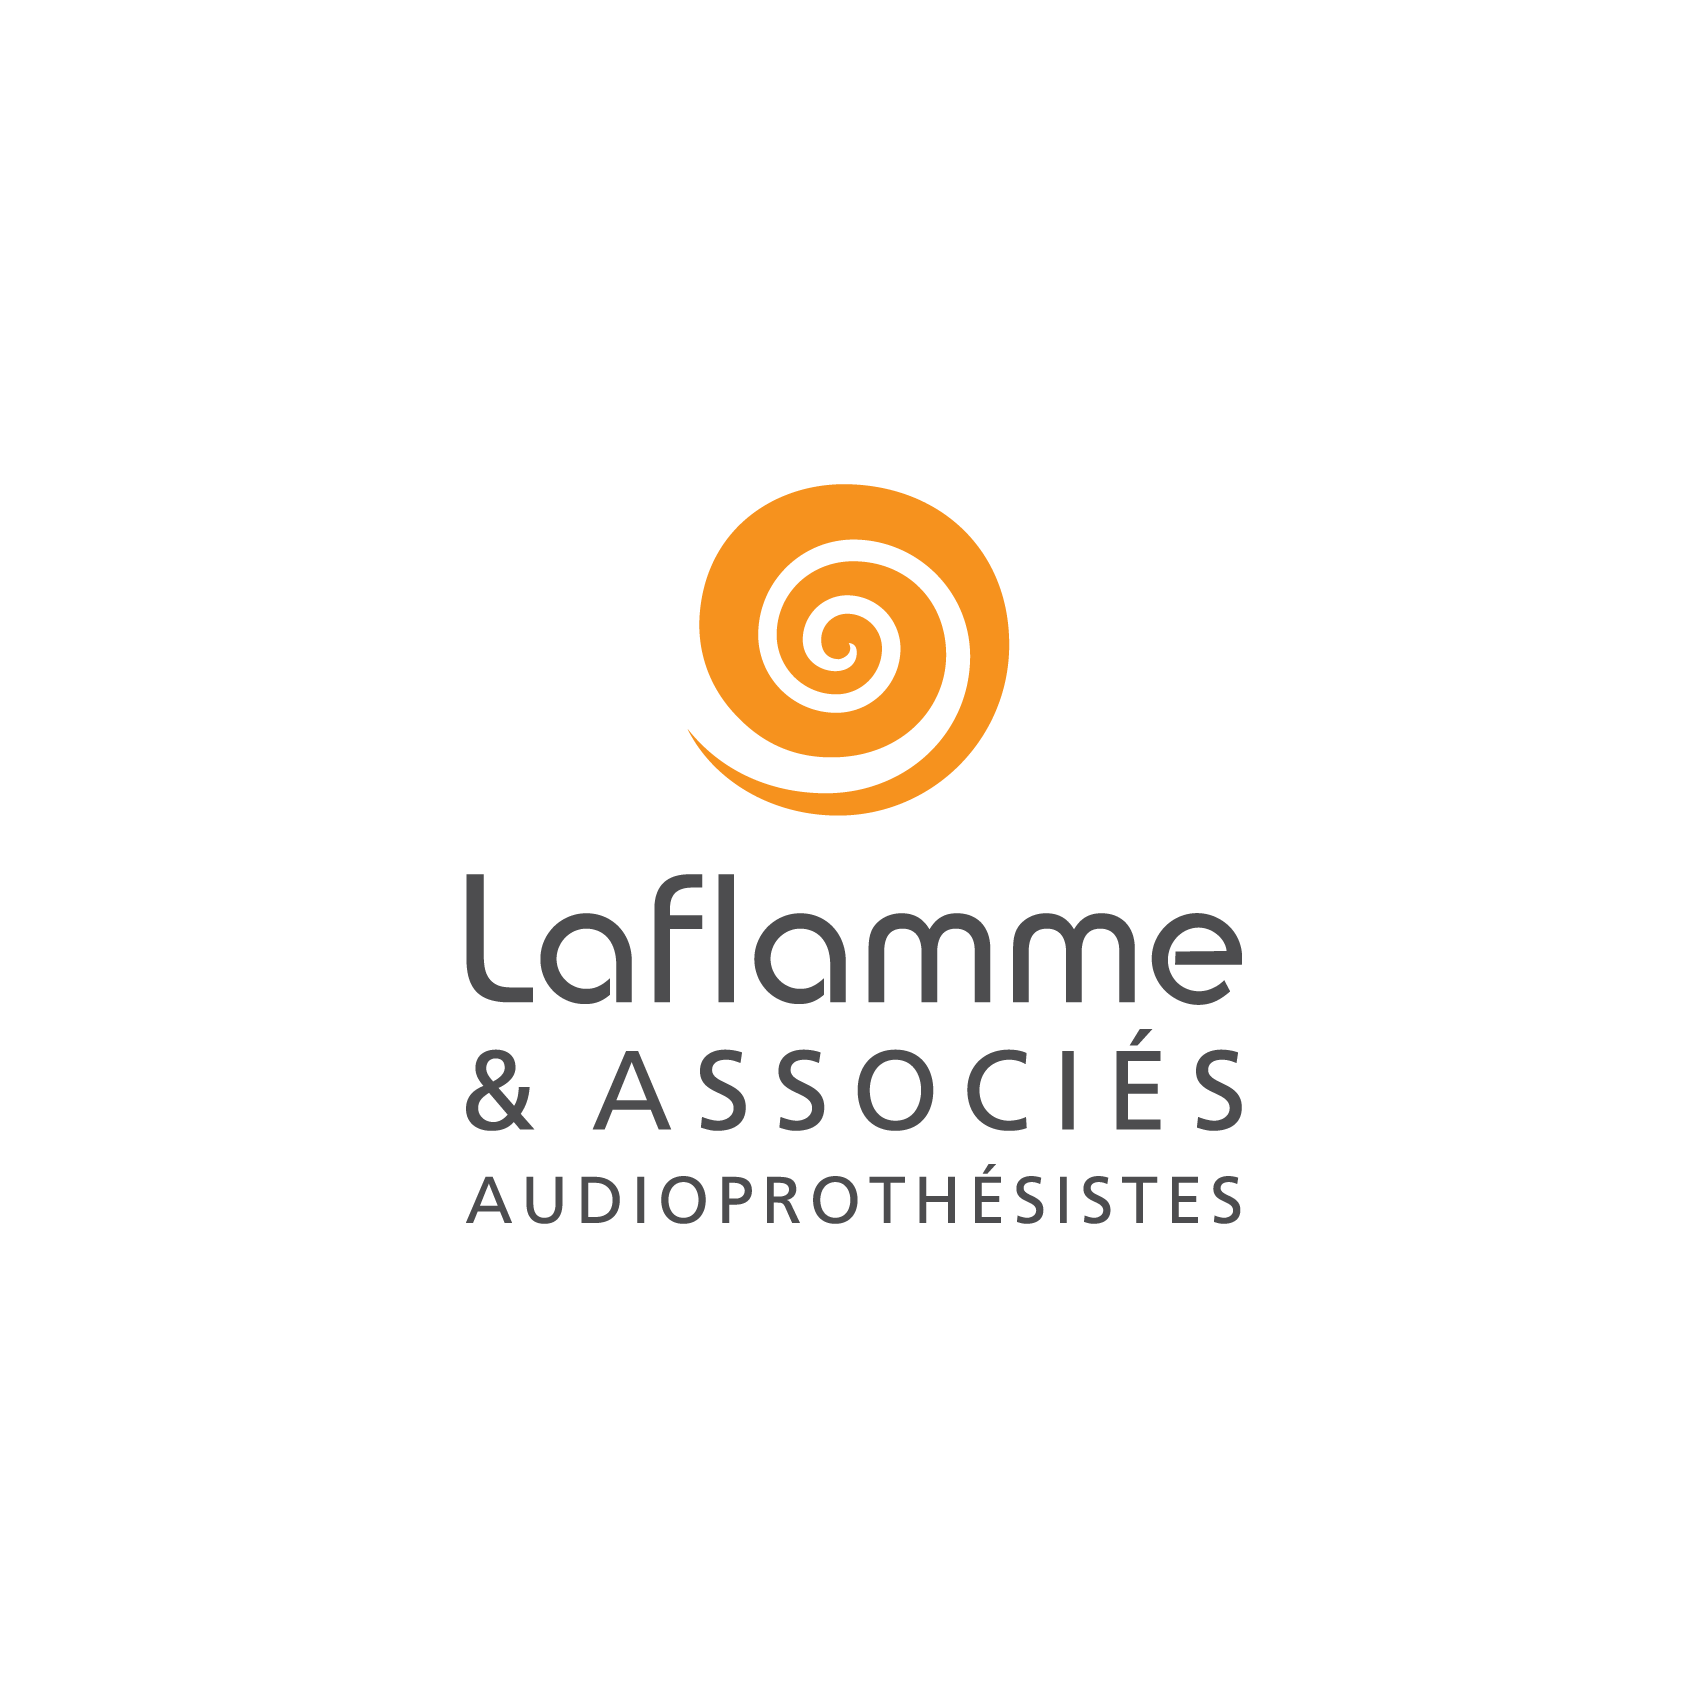 MlleRouge_logos_Laflamme